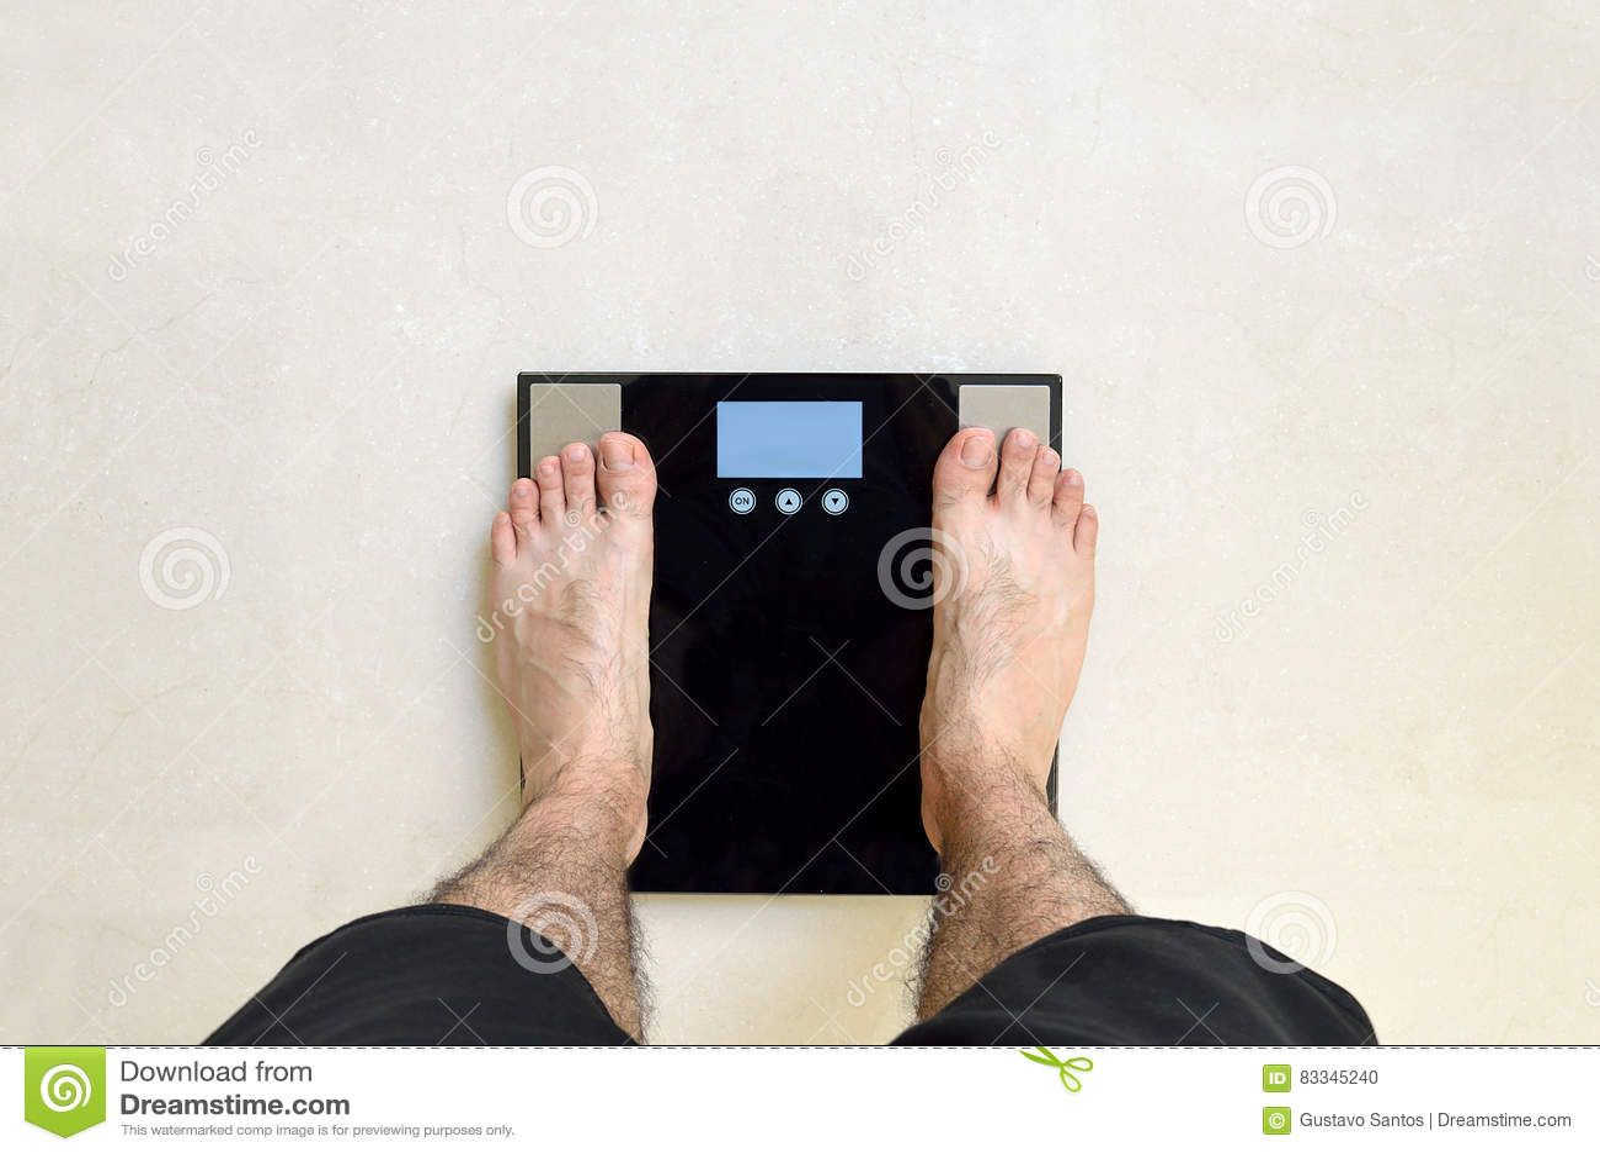 Black Bathroom Scales Man Standing On A Black Bathroom Scale Stock Photo Image 83345240